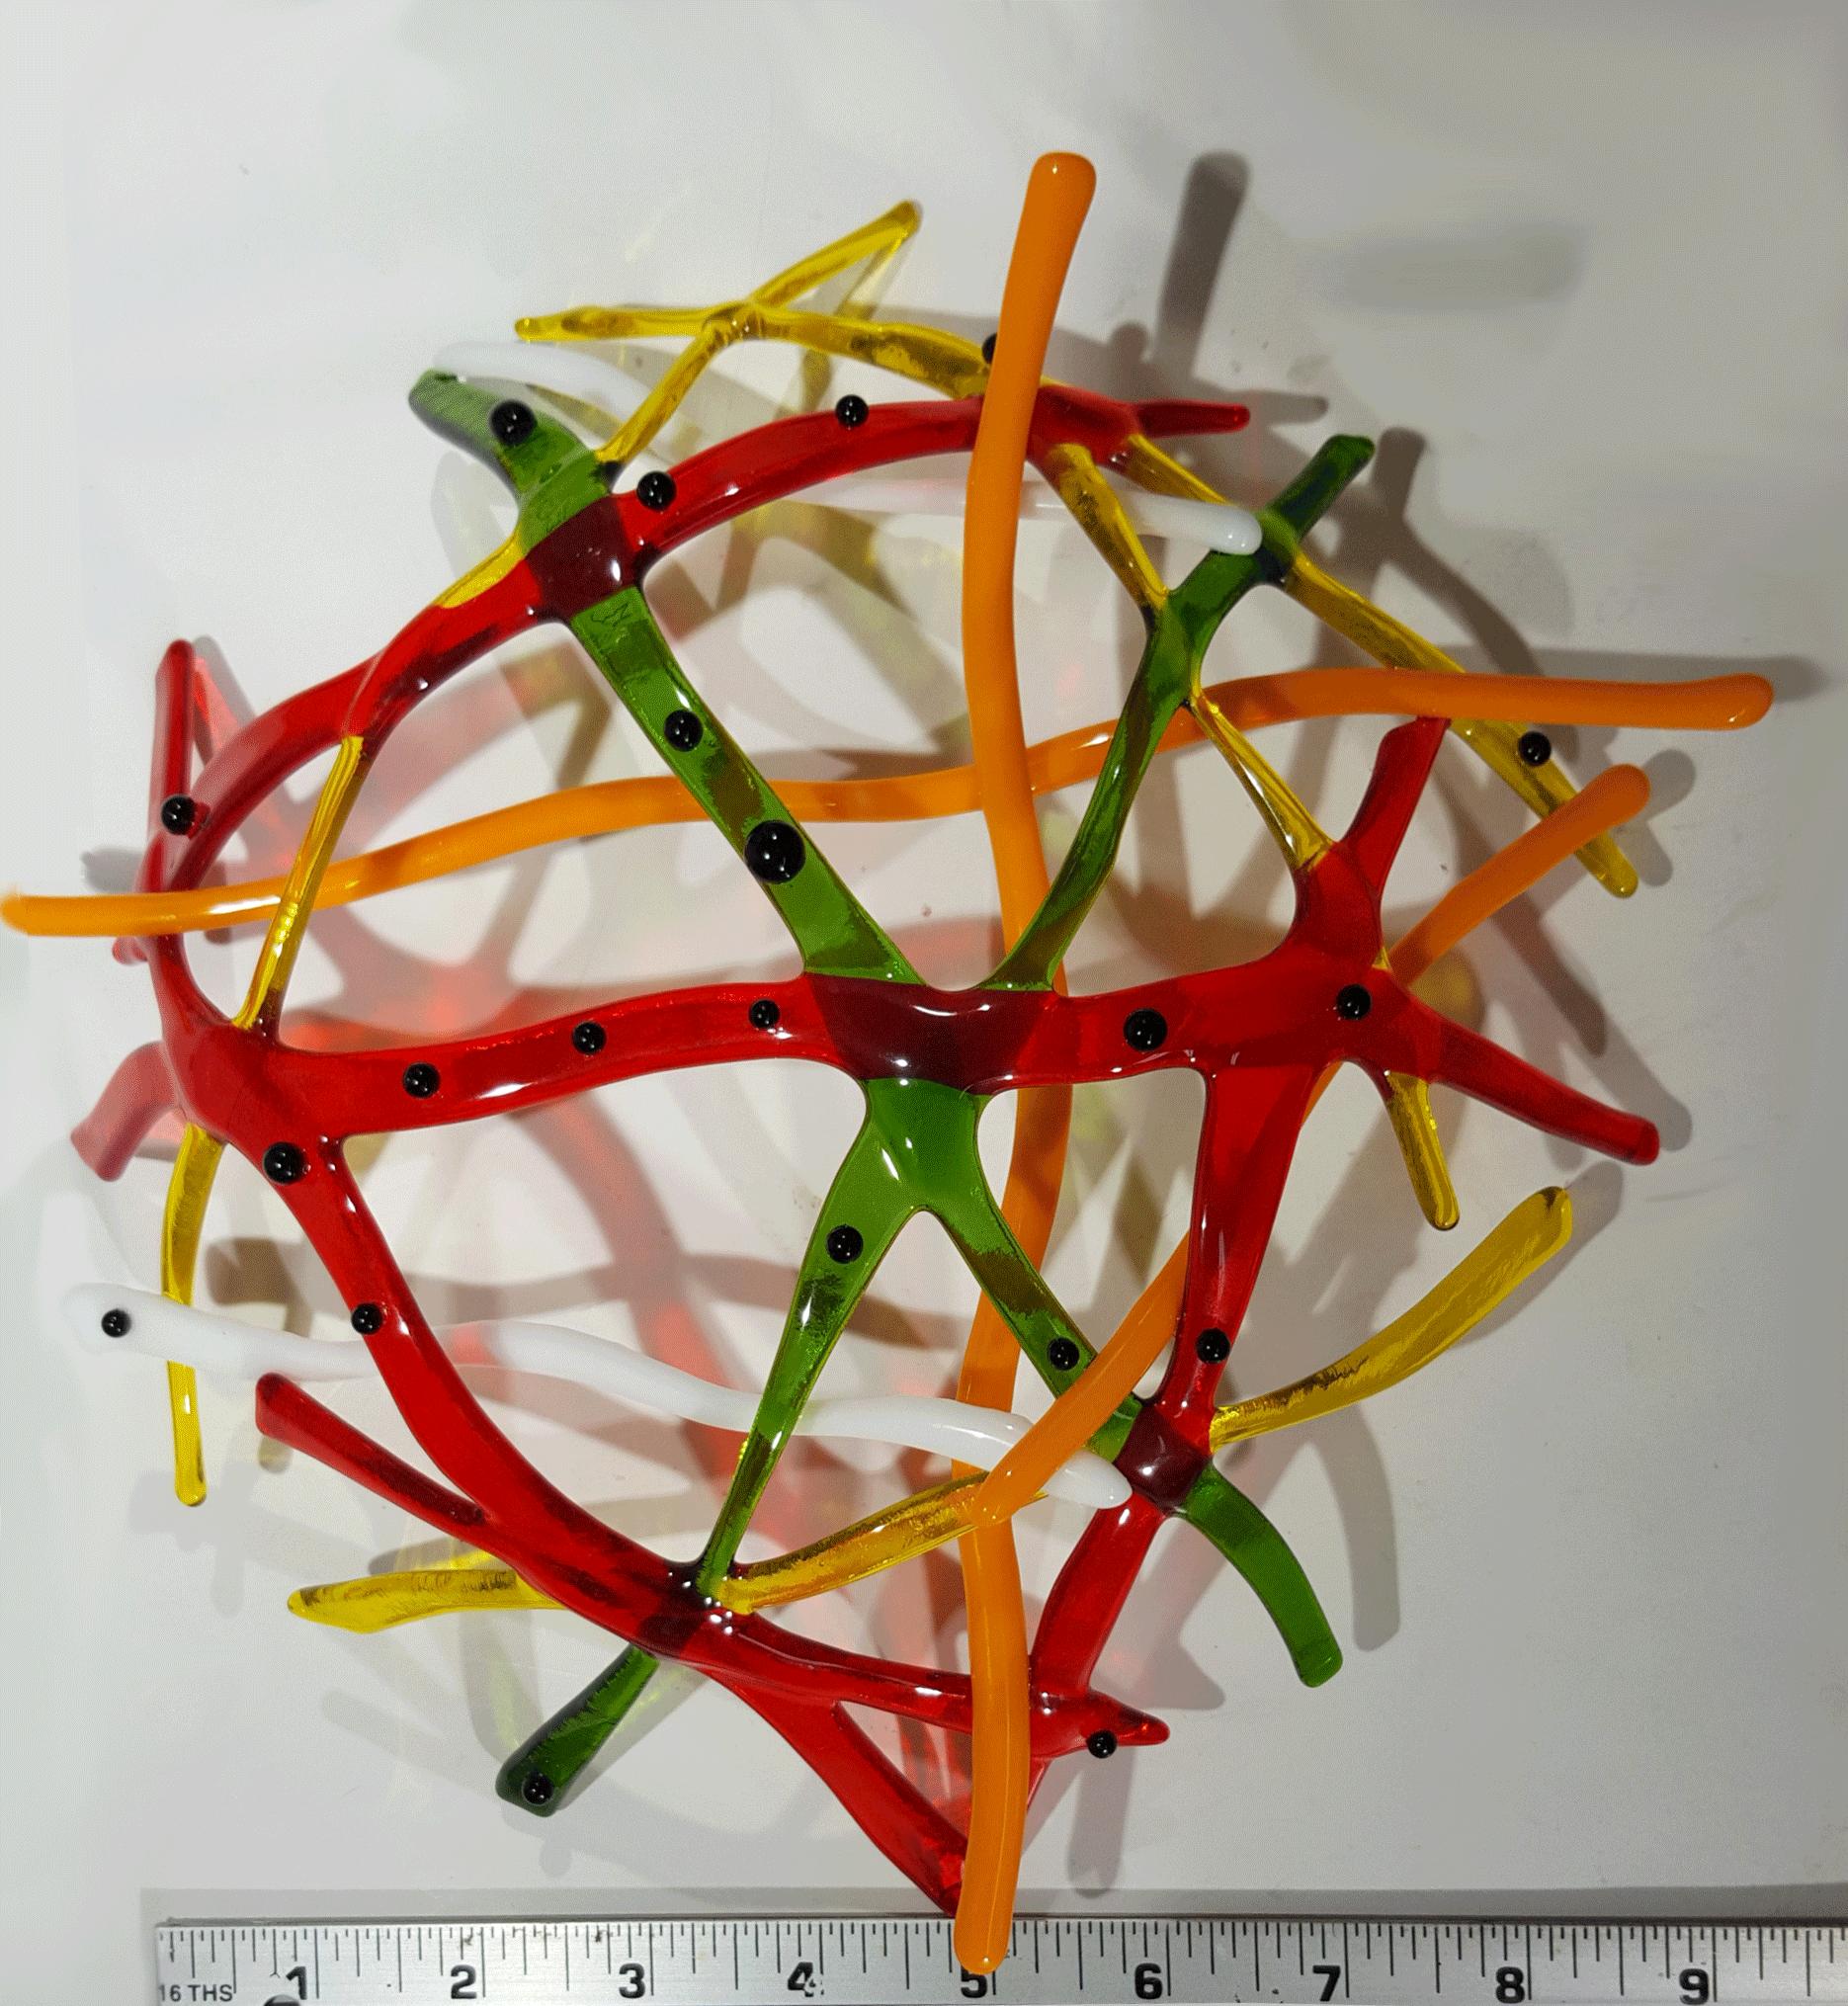 a-Organic-Variation-Bullseye-Green,-red,-yellow-and-orange--with-black--Goo-Gaas